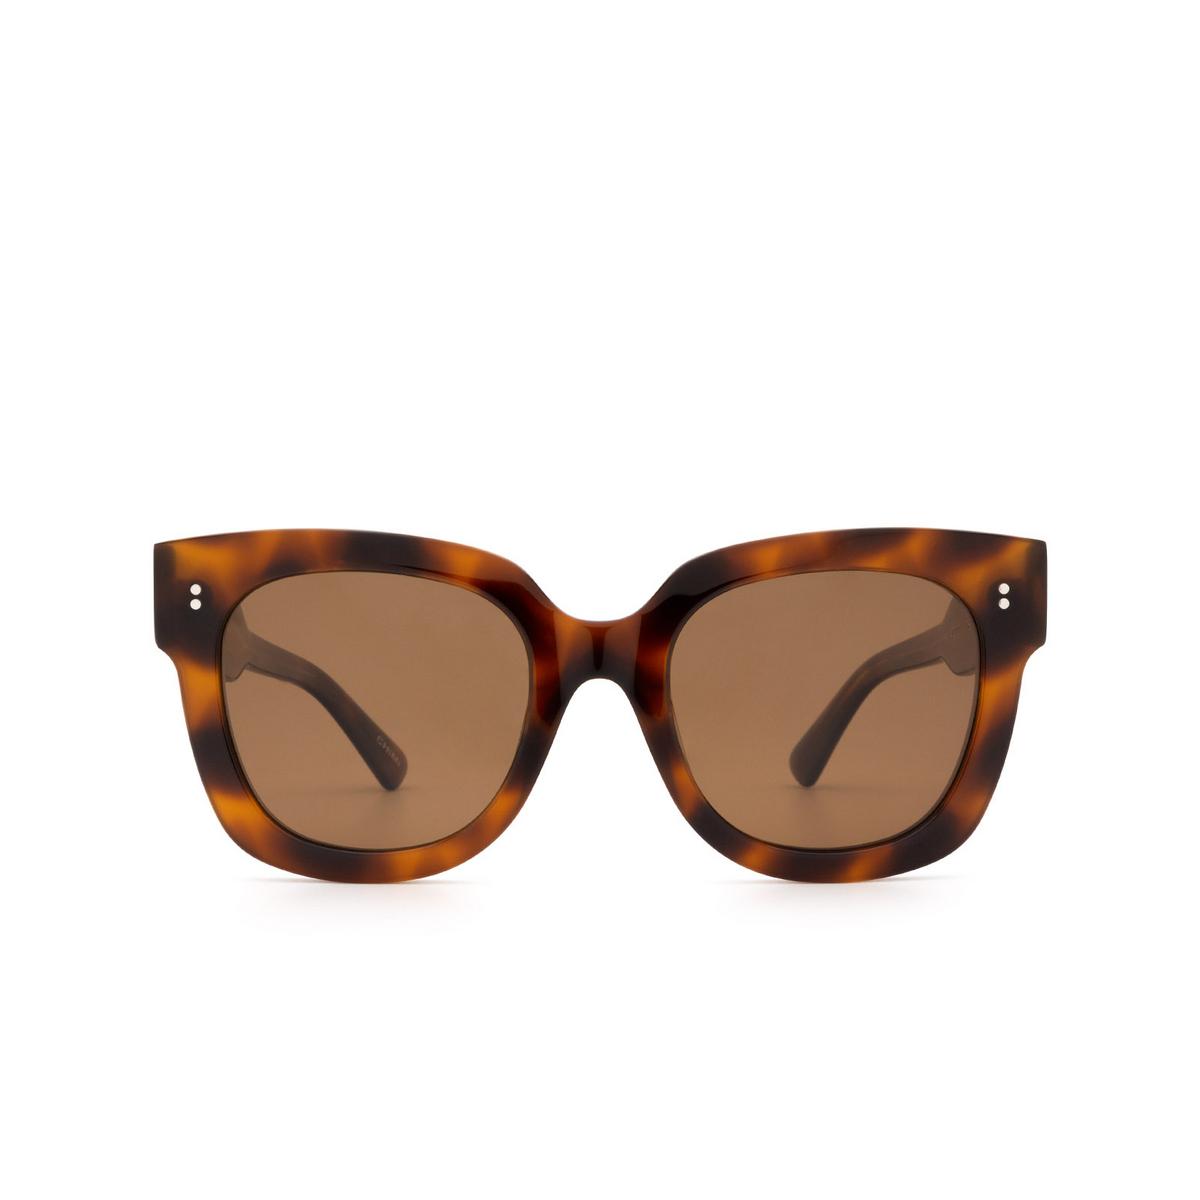 Chimi® Square Sunglasses: 08 color Tortoise - front view.